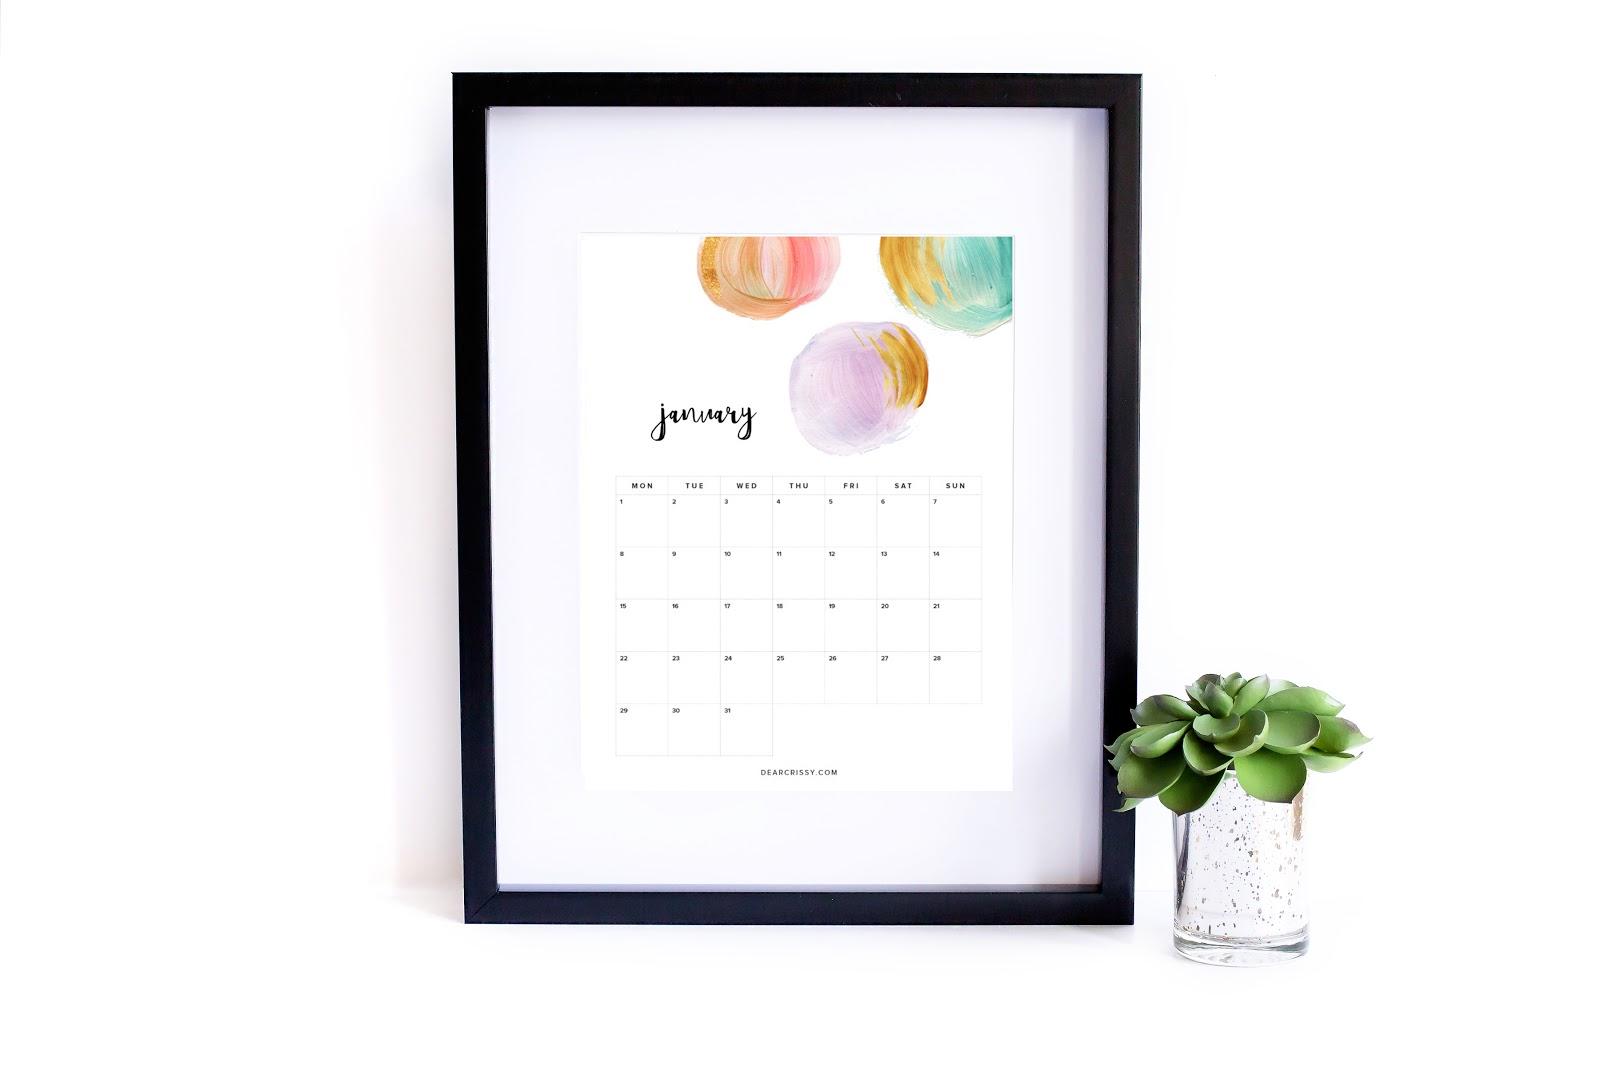 kalendarz 2018 do druku - planer